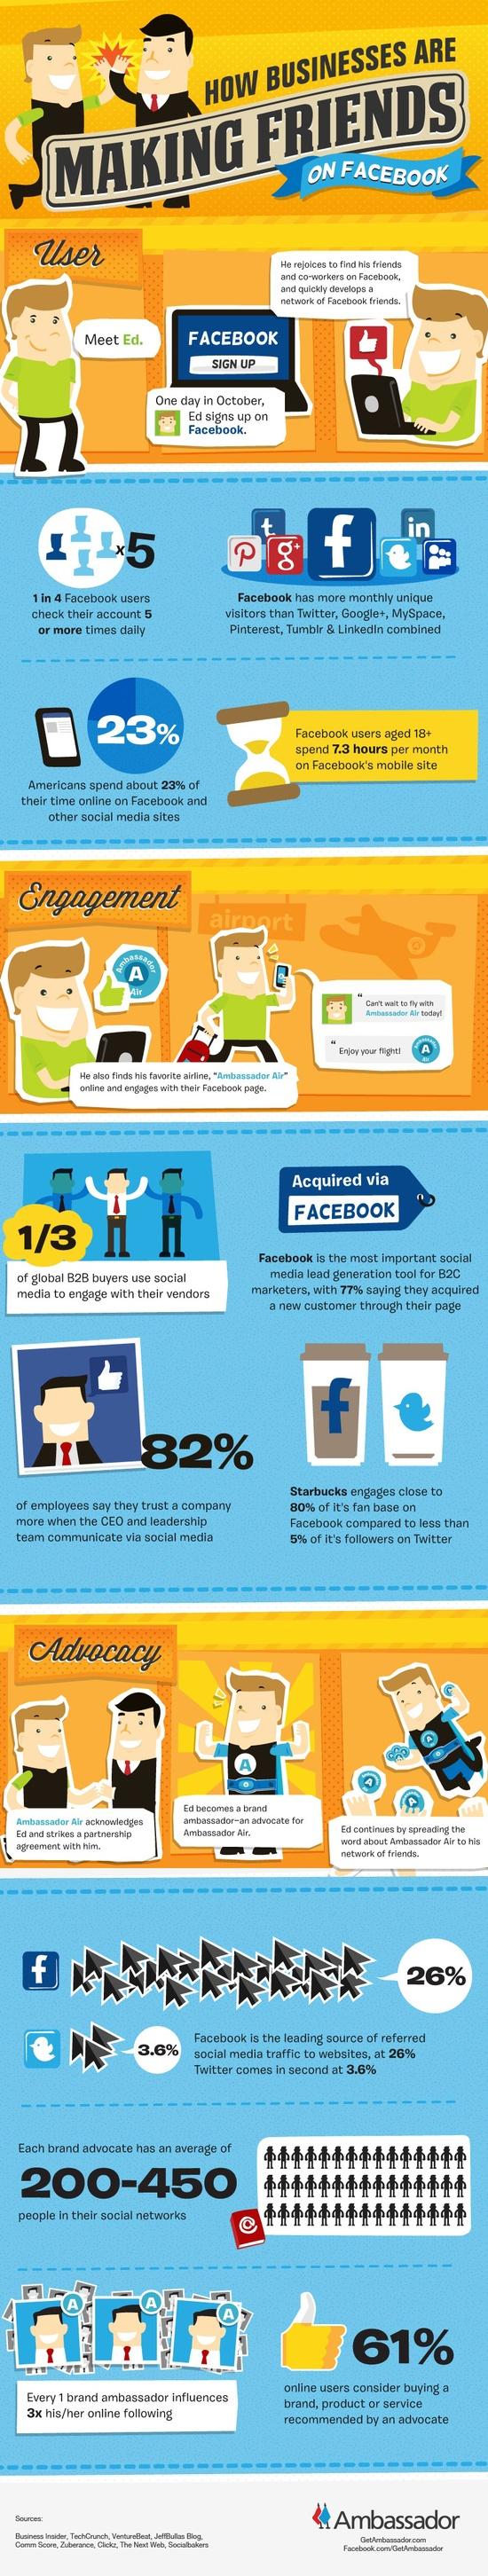 how-businesses-are-making-friends-on-facebook Credit: ambassador